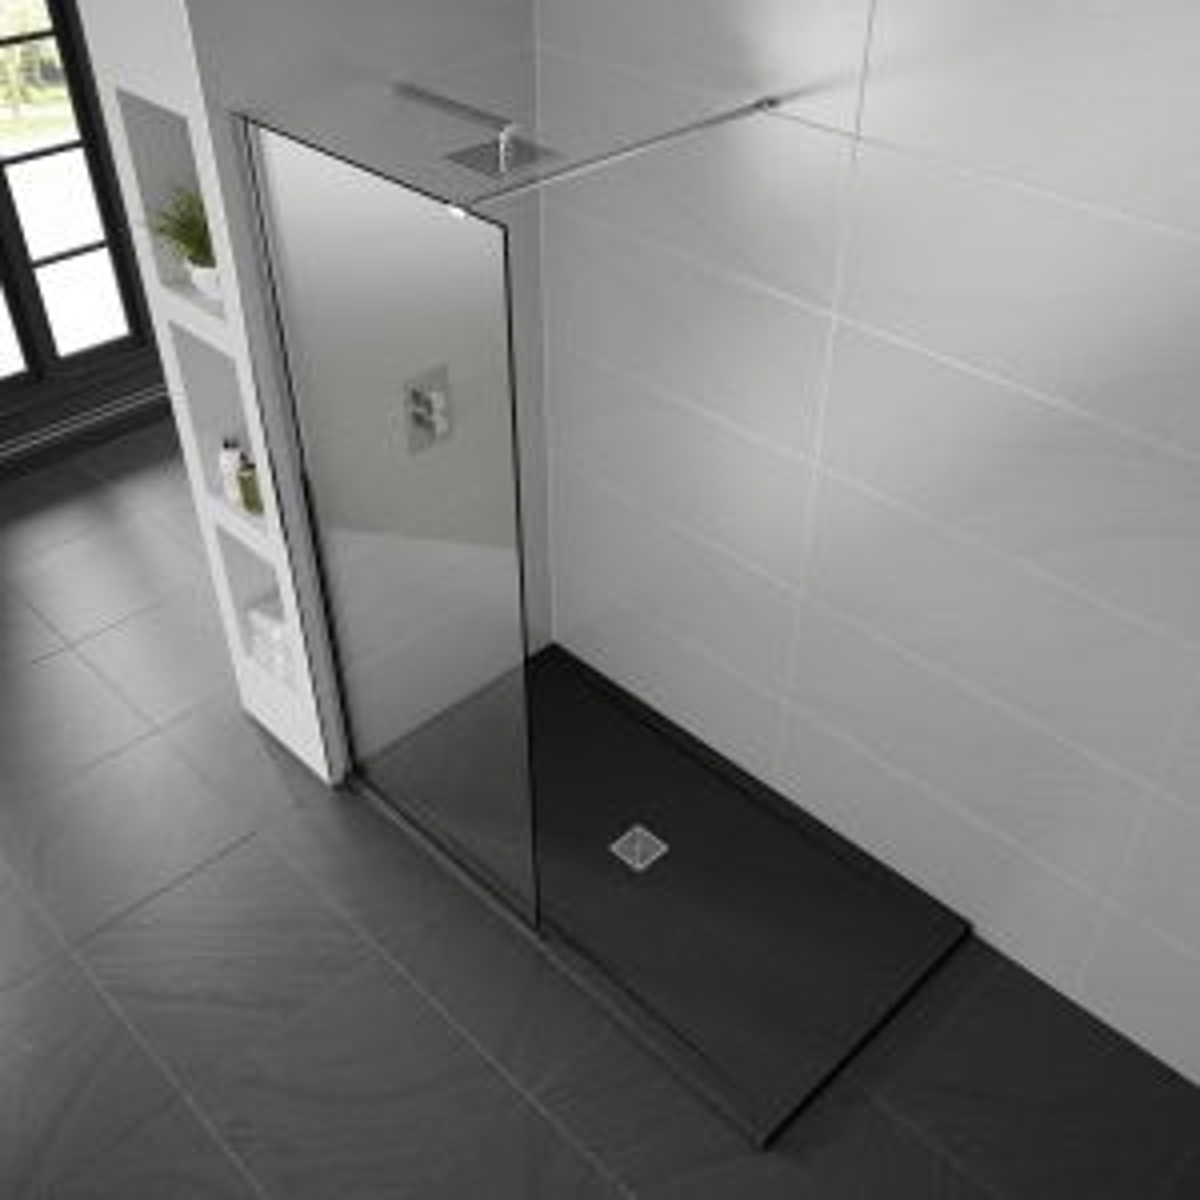 Aquadart Black Slate Shower Tray 1600 x 800 Lifestyle